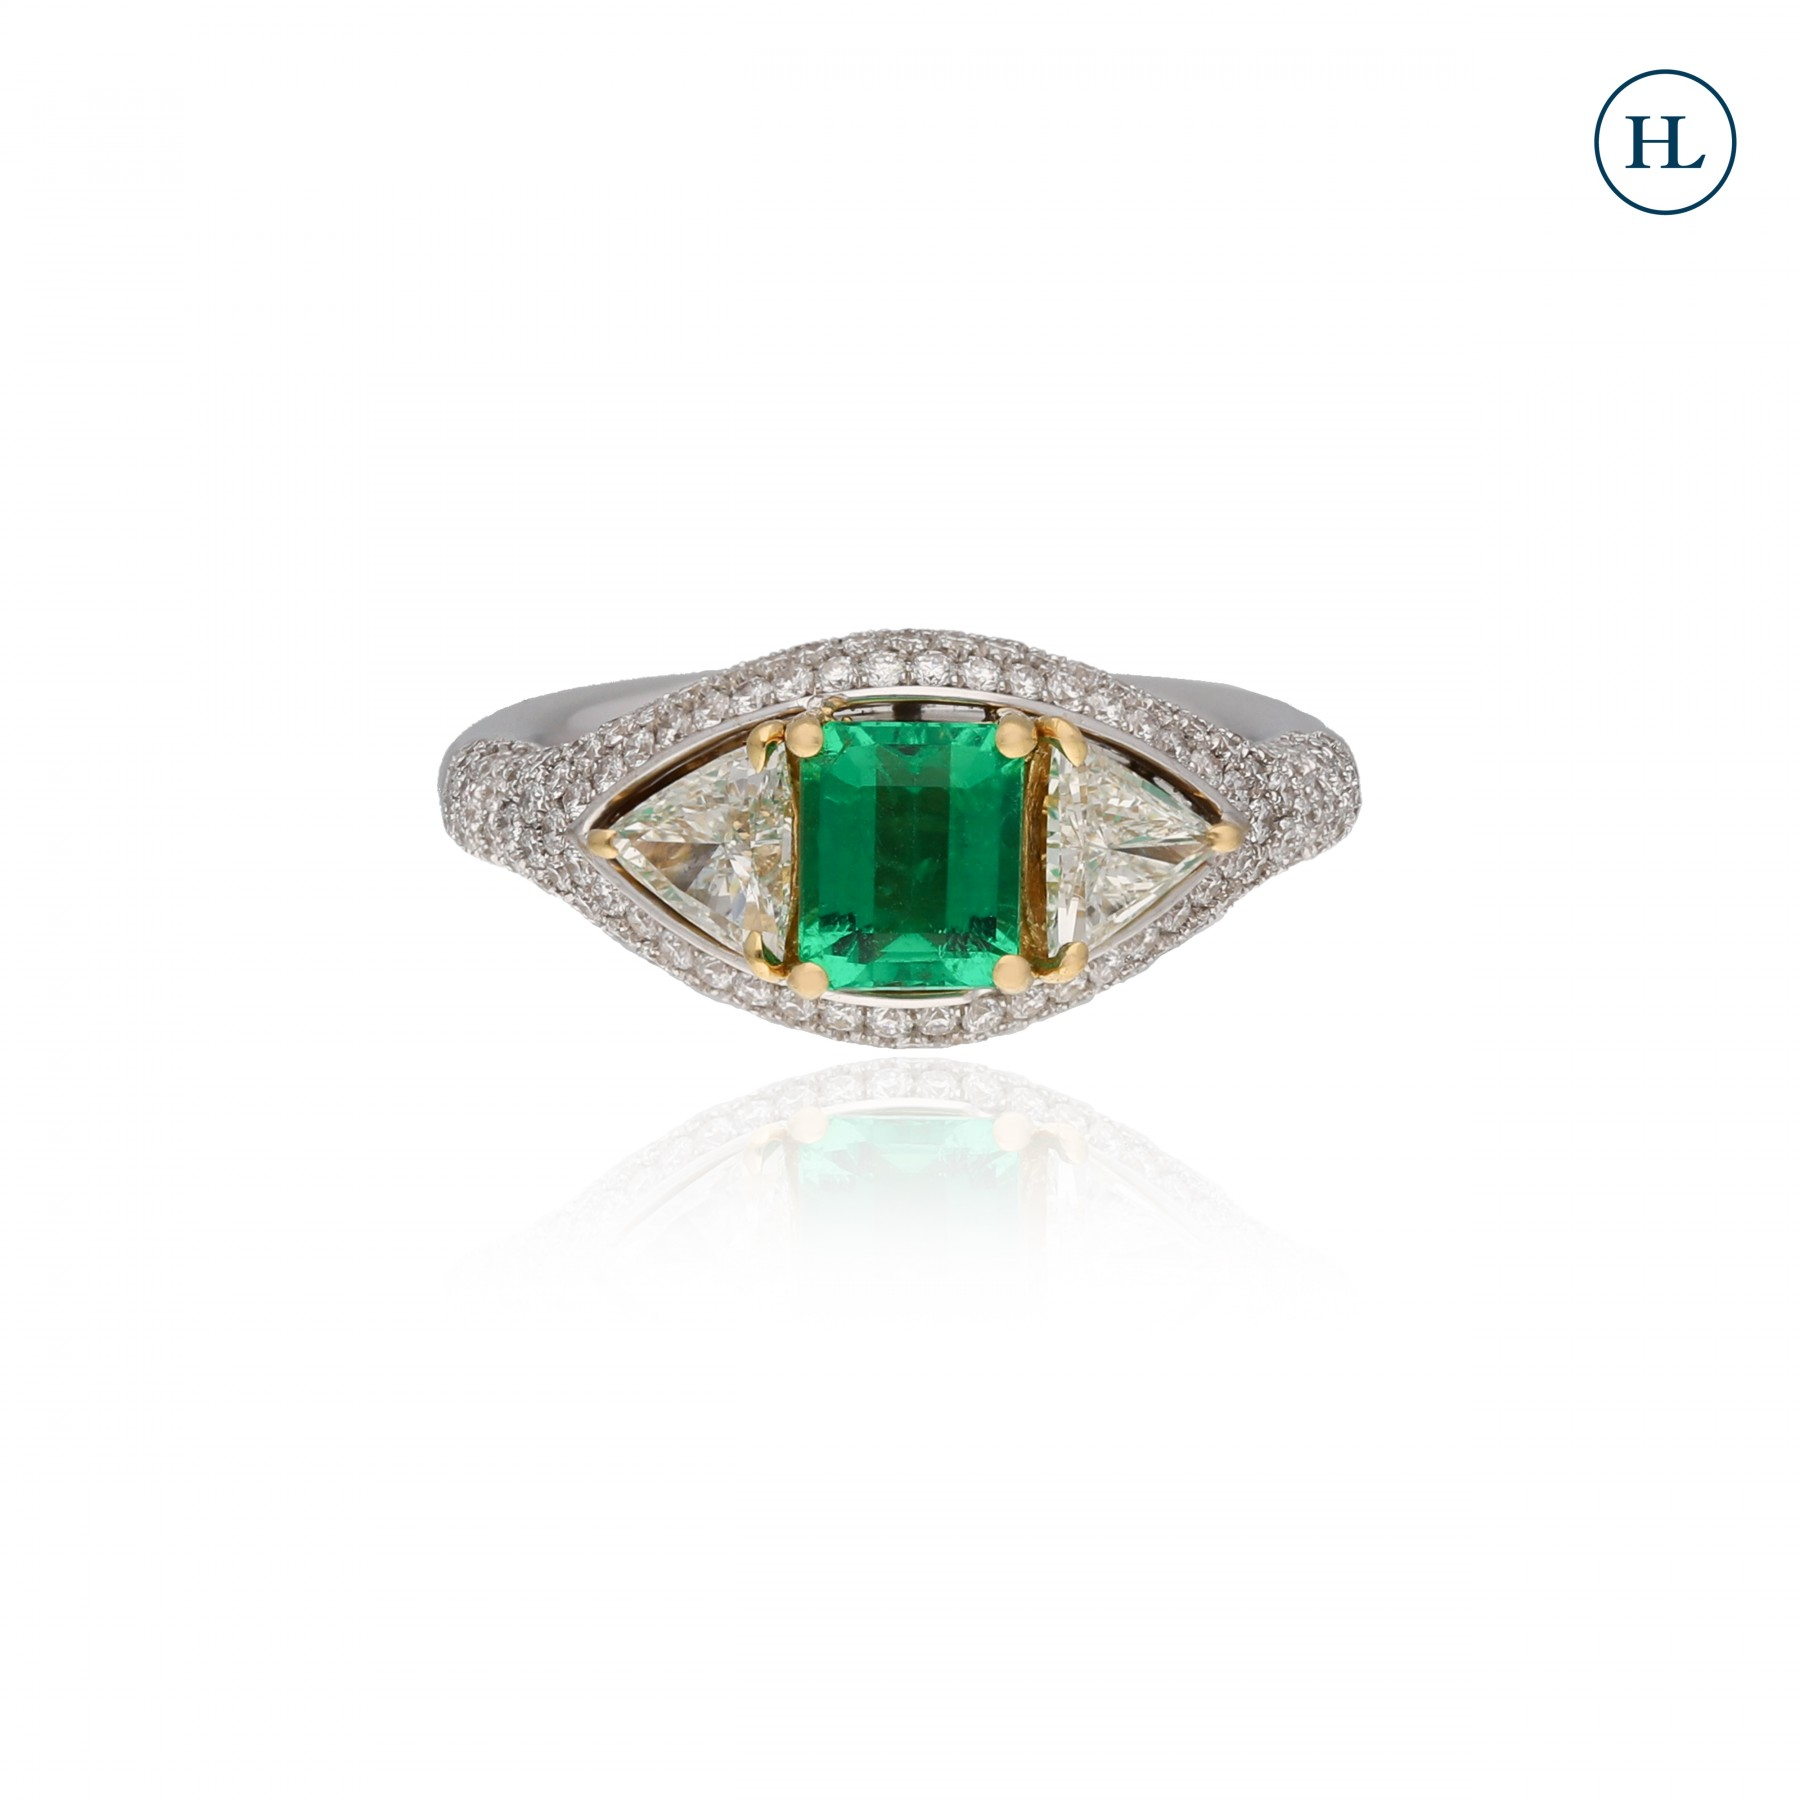 Trilliant Cut Diamond & Emerald Ring